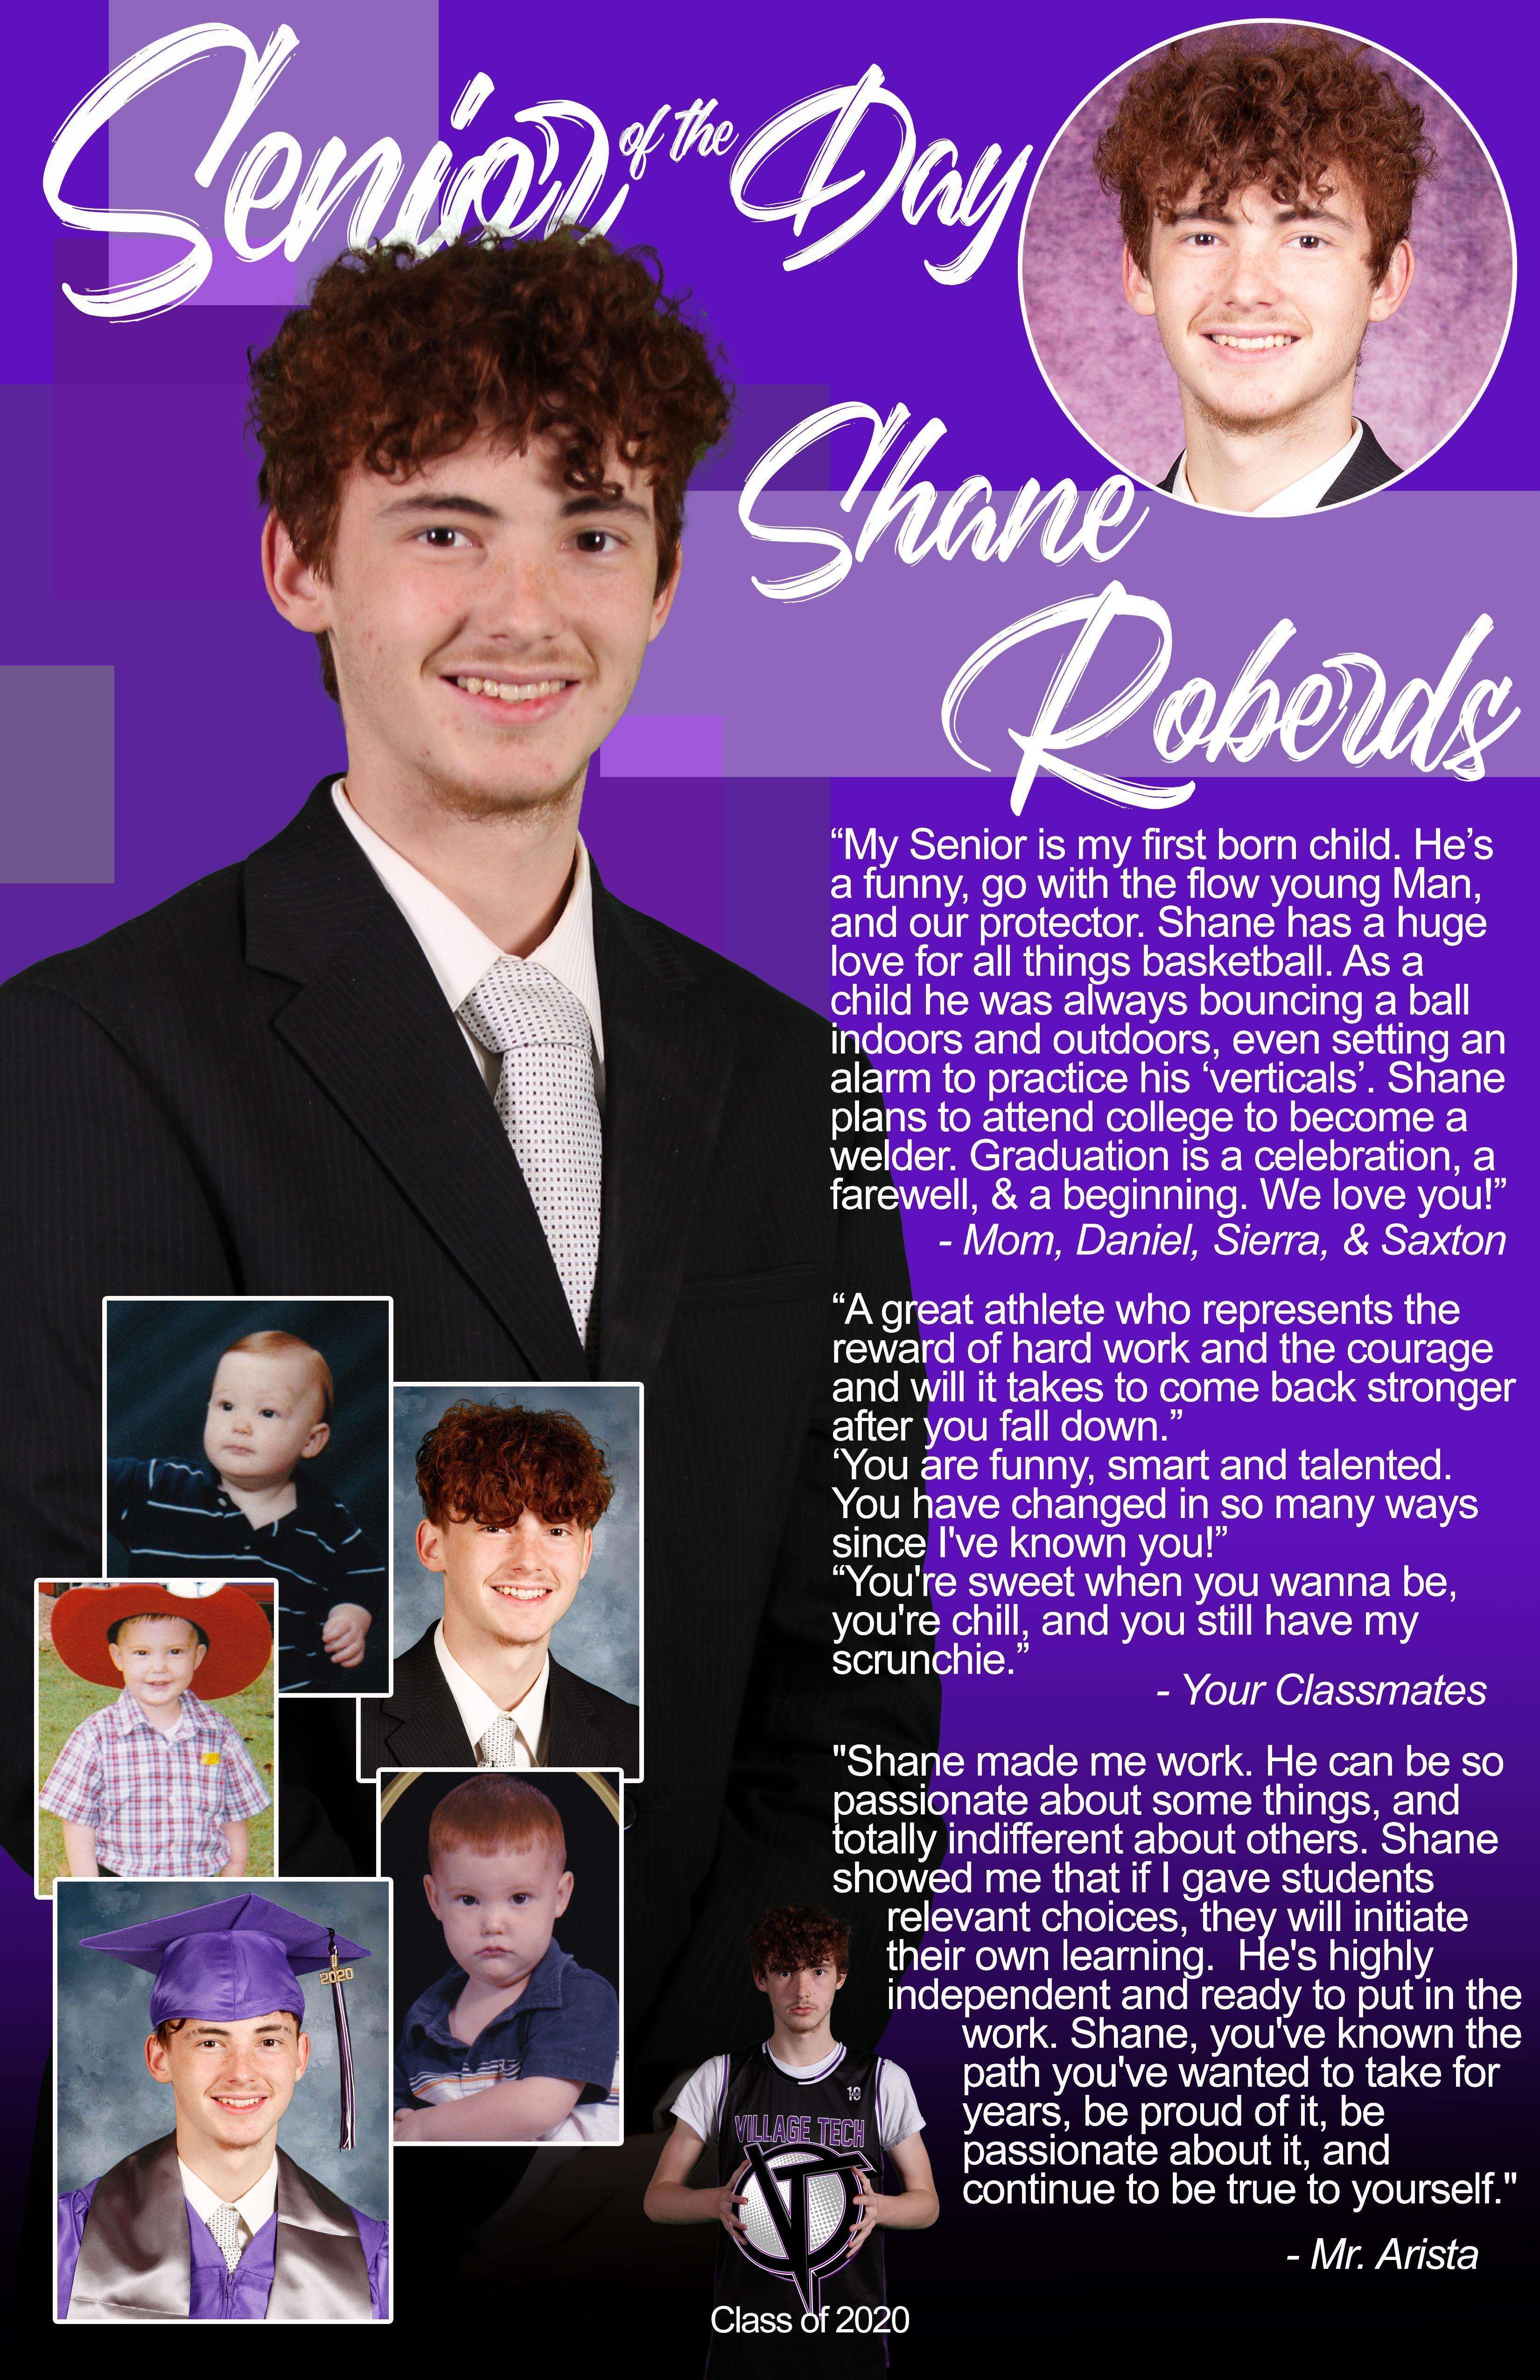 Shane Roberds